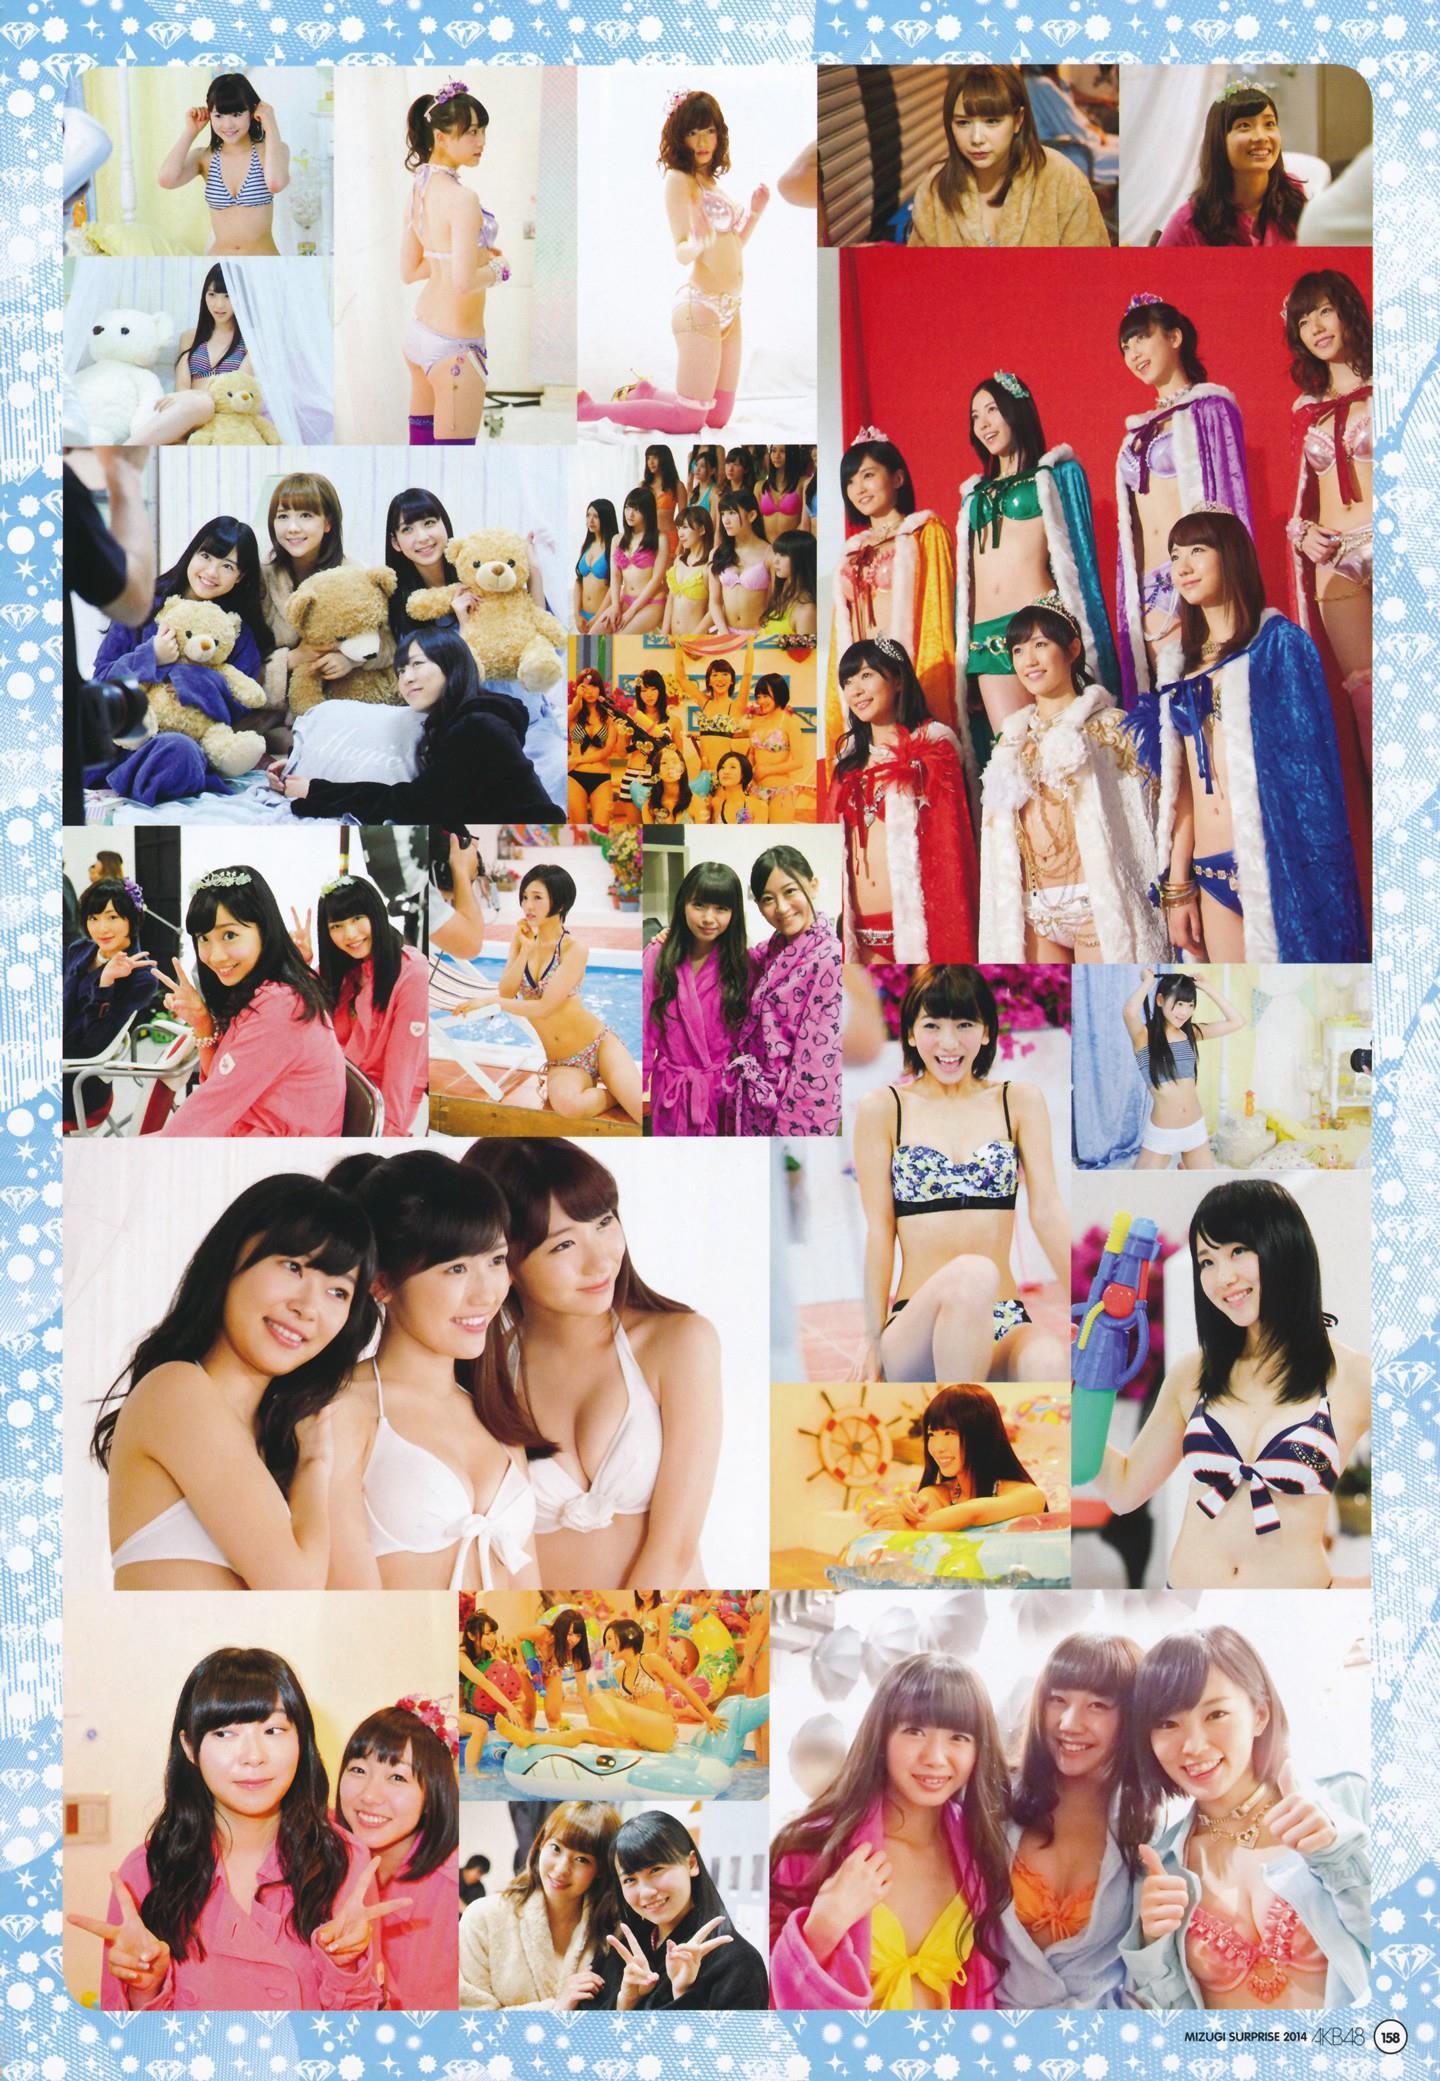 AKB48人気メンバー 画像 145